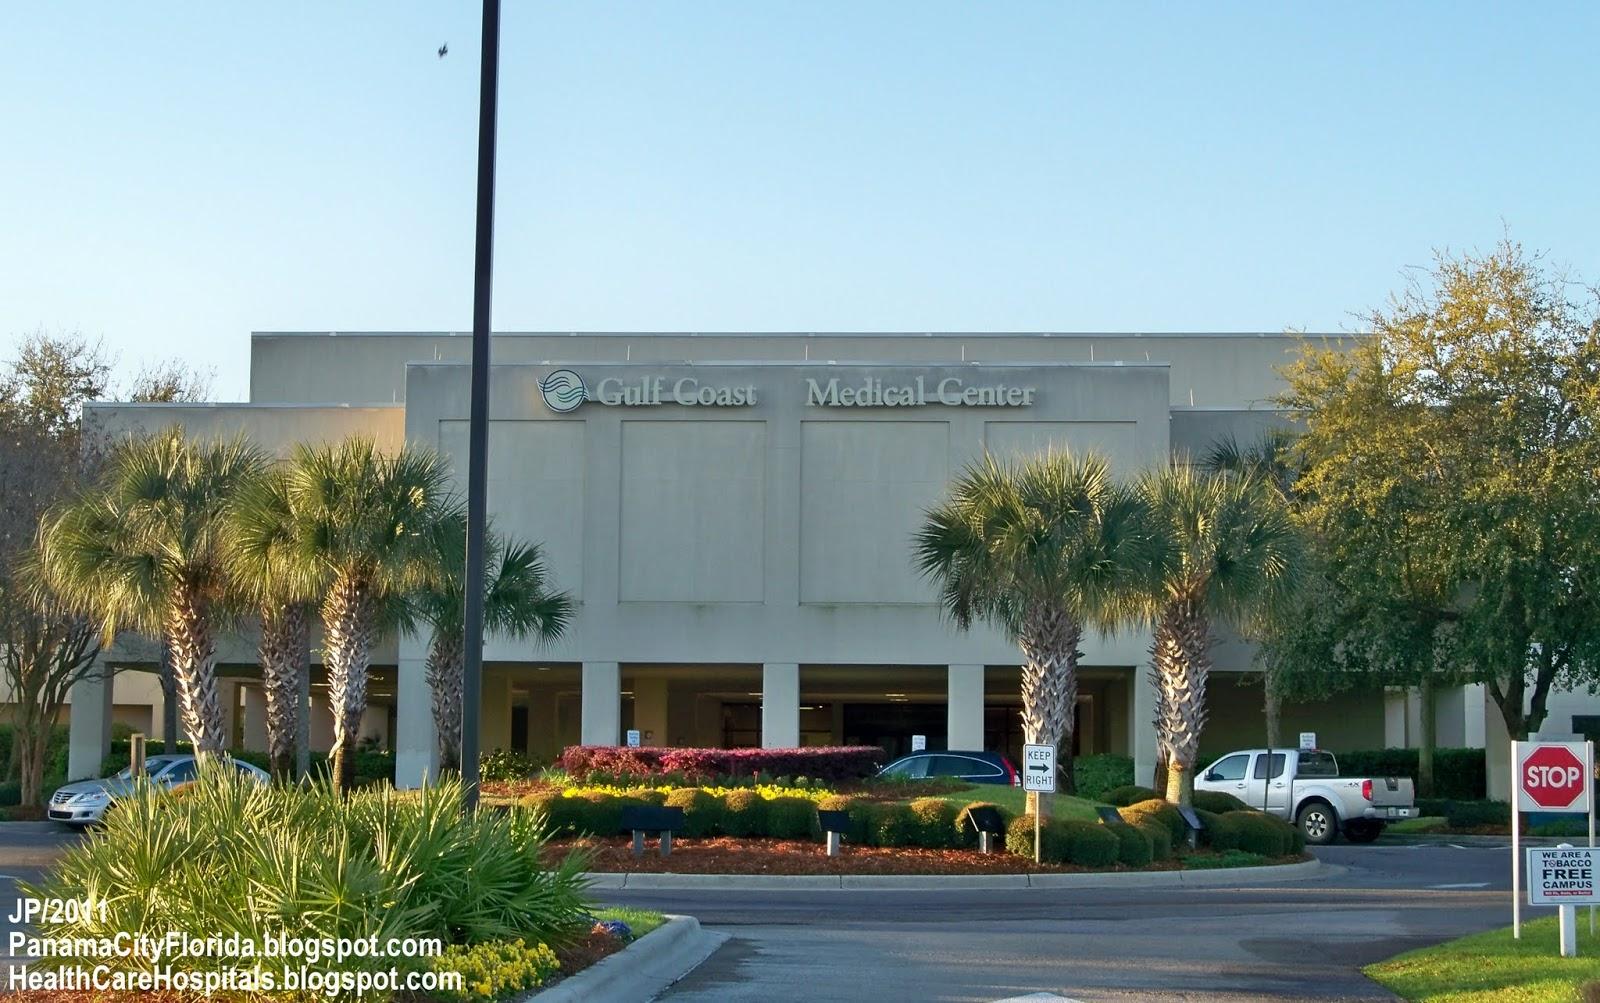 Health Care Hospital Medical Center Dr Urgent Clinic Ga Fl Al Cancer Ambulance Dialysis